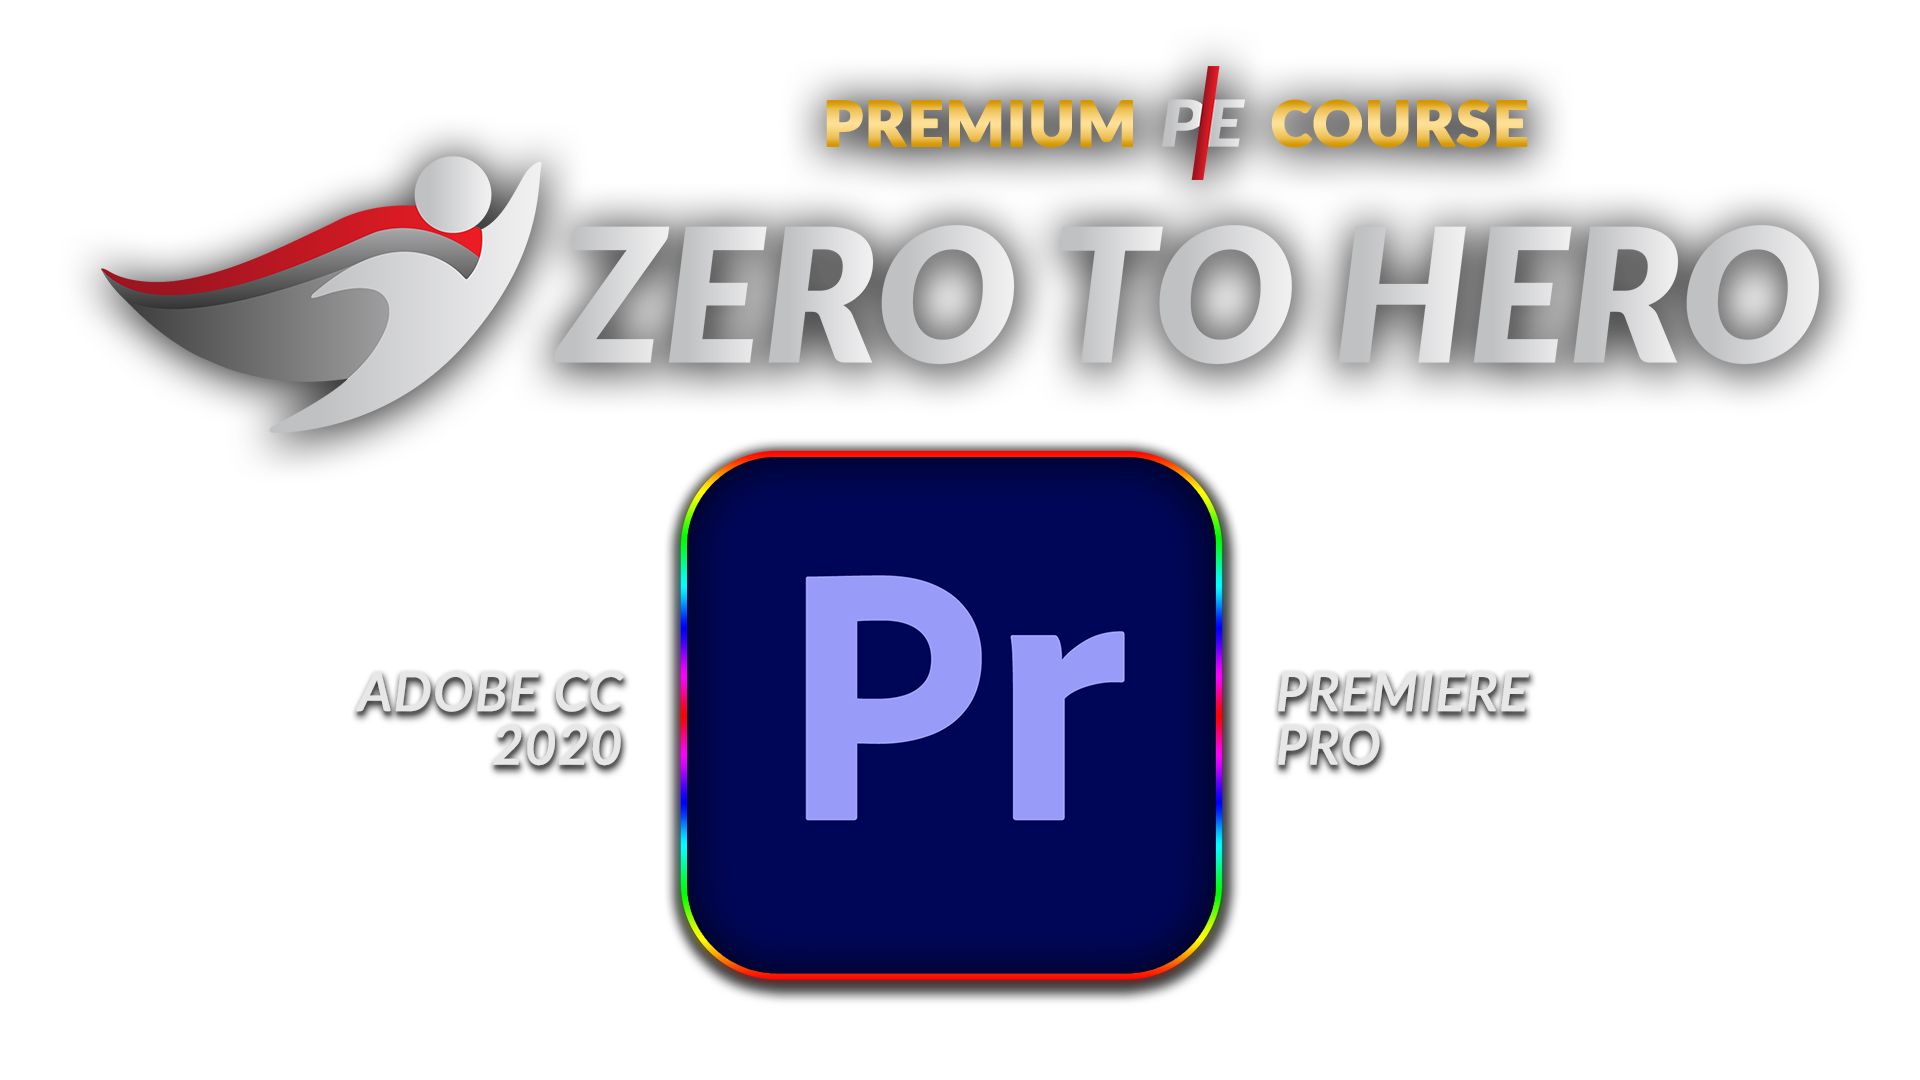 Zero to Hero: Adobe Premiere Pro